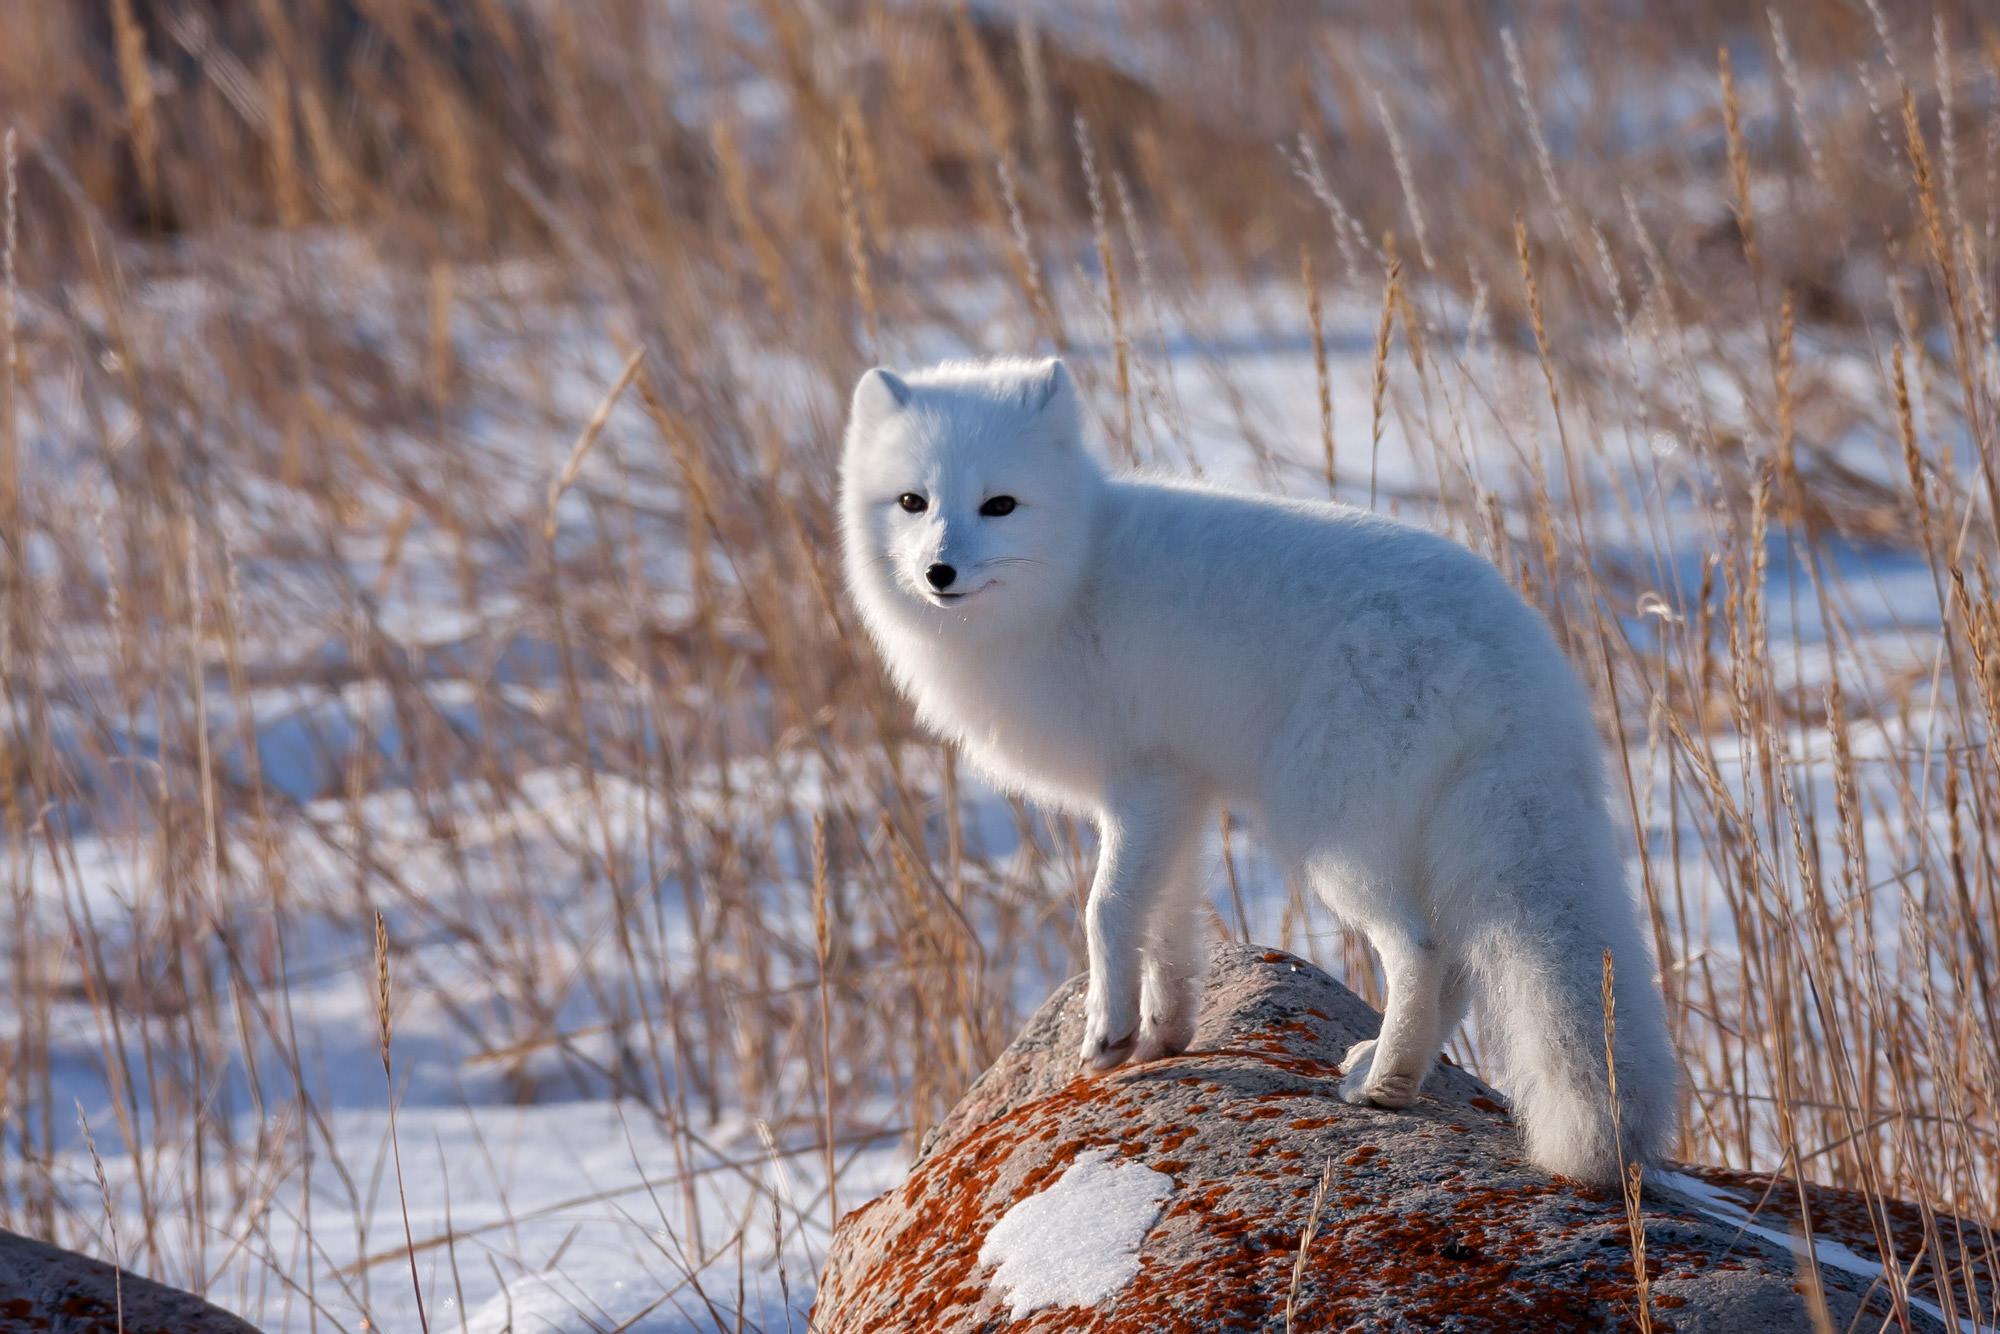 Fox, Arctic Fox, Canada, Winter, Manitoba, limited edition, photograph, fine art, wildlife, photo